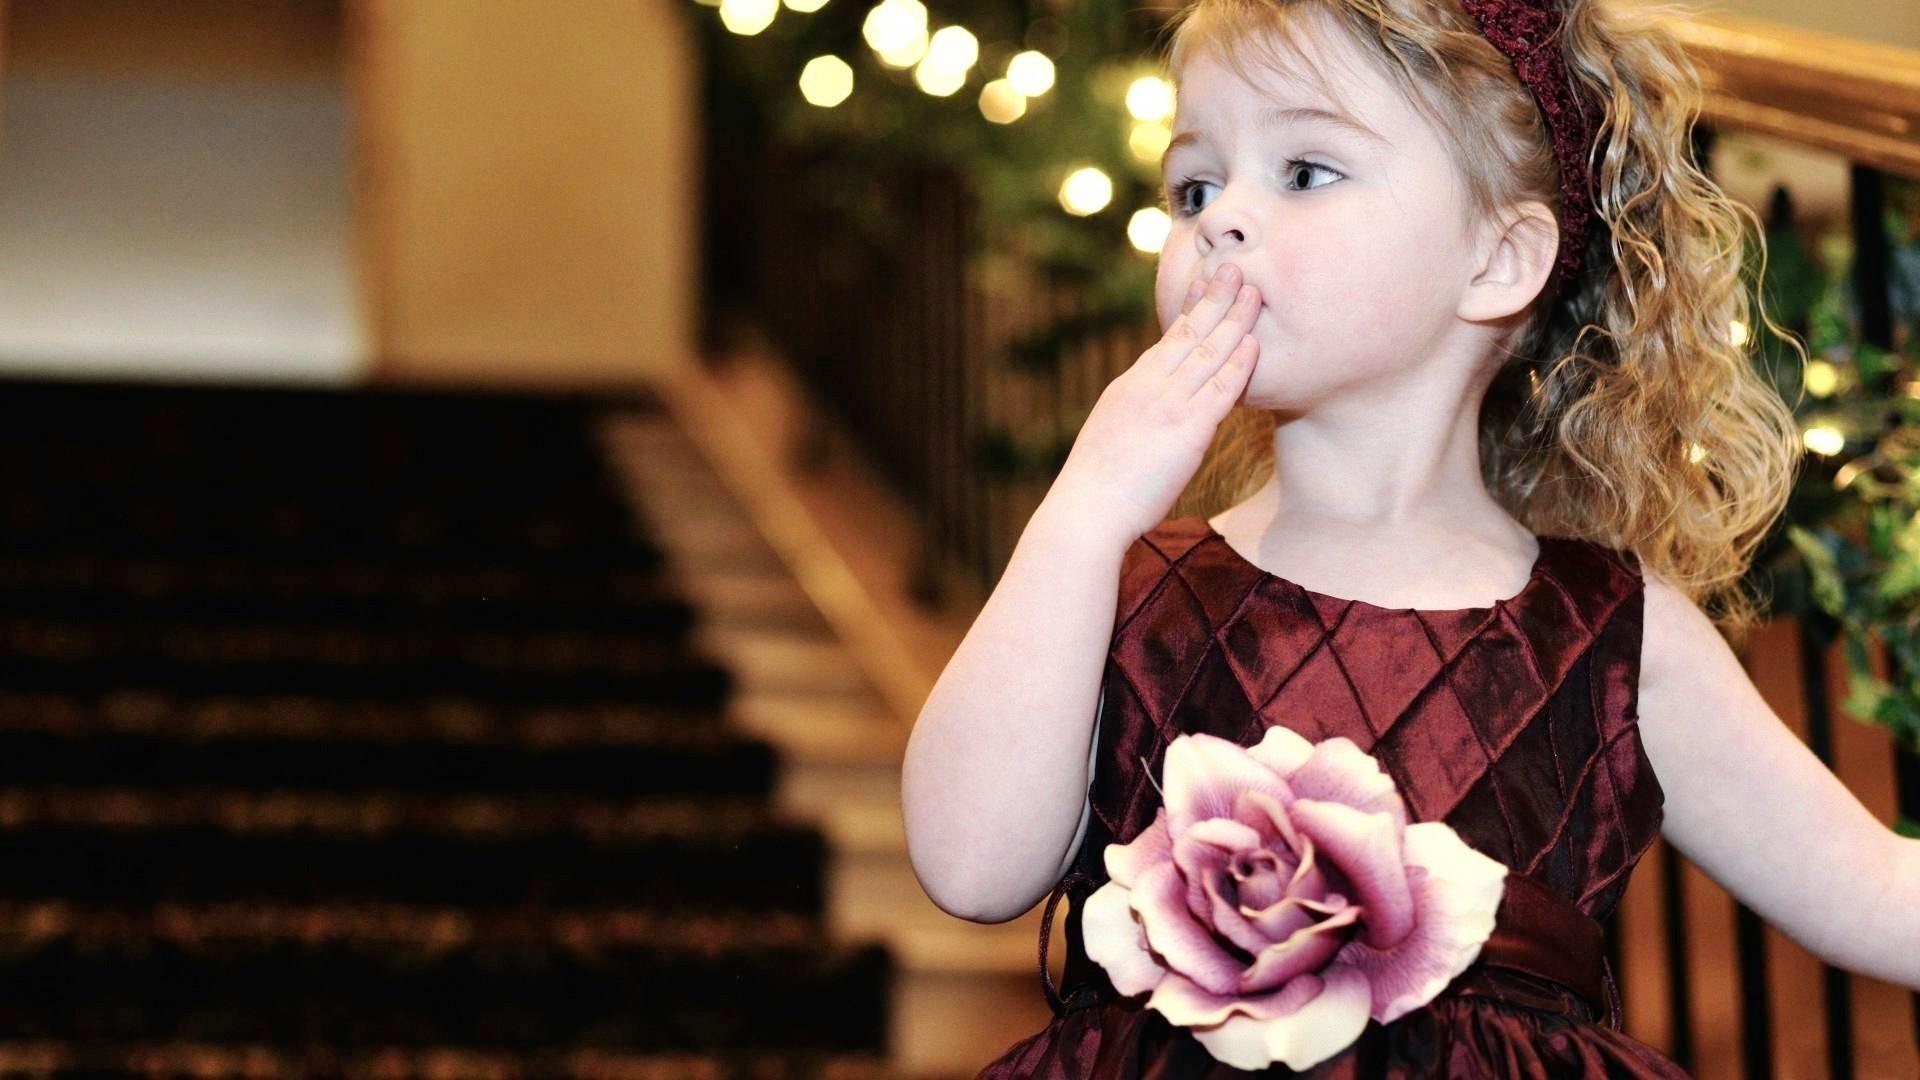 20 Adorable Cute Baby Girl Photos-Wallpapers | InspiringMesh | Images  Wallpapers | Pinterest | Wallpaper